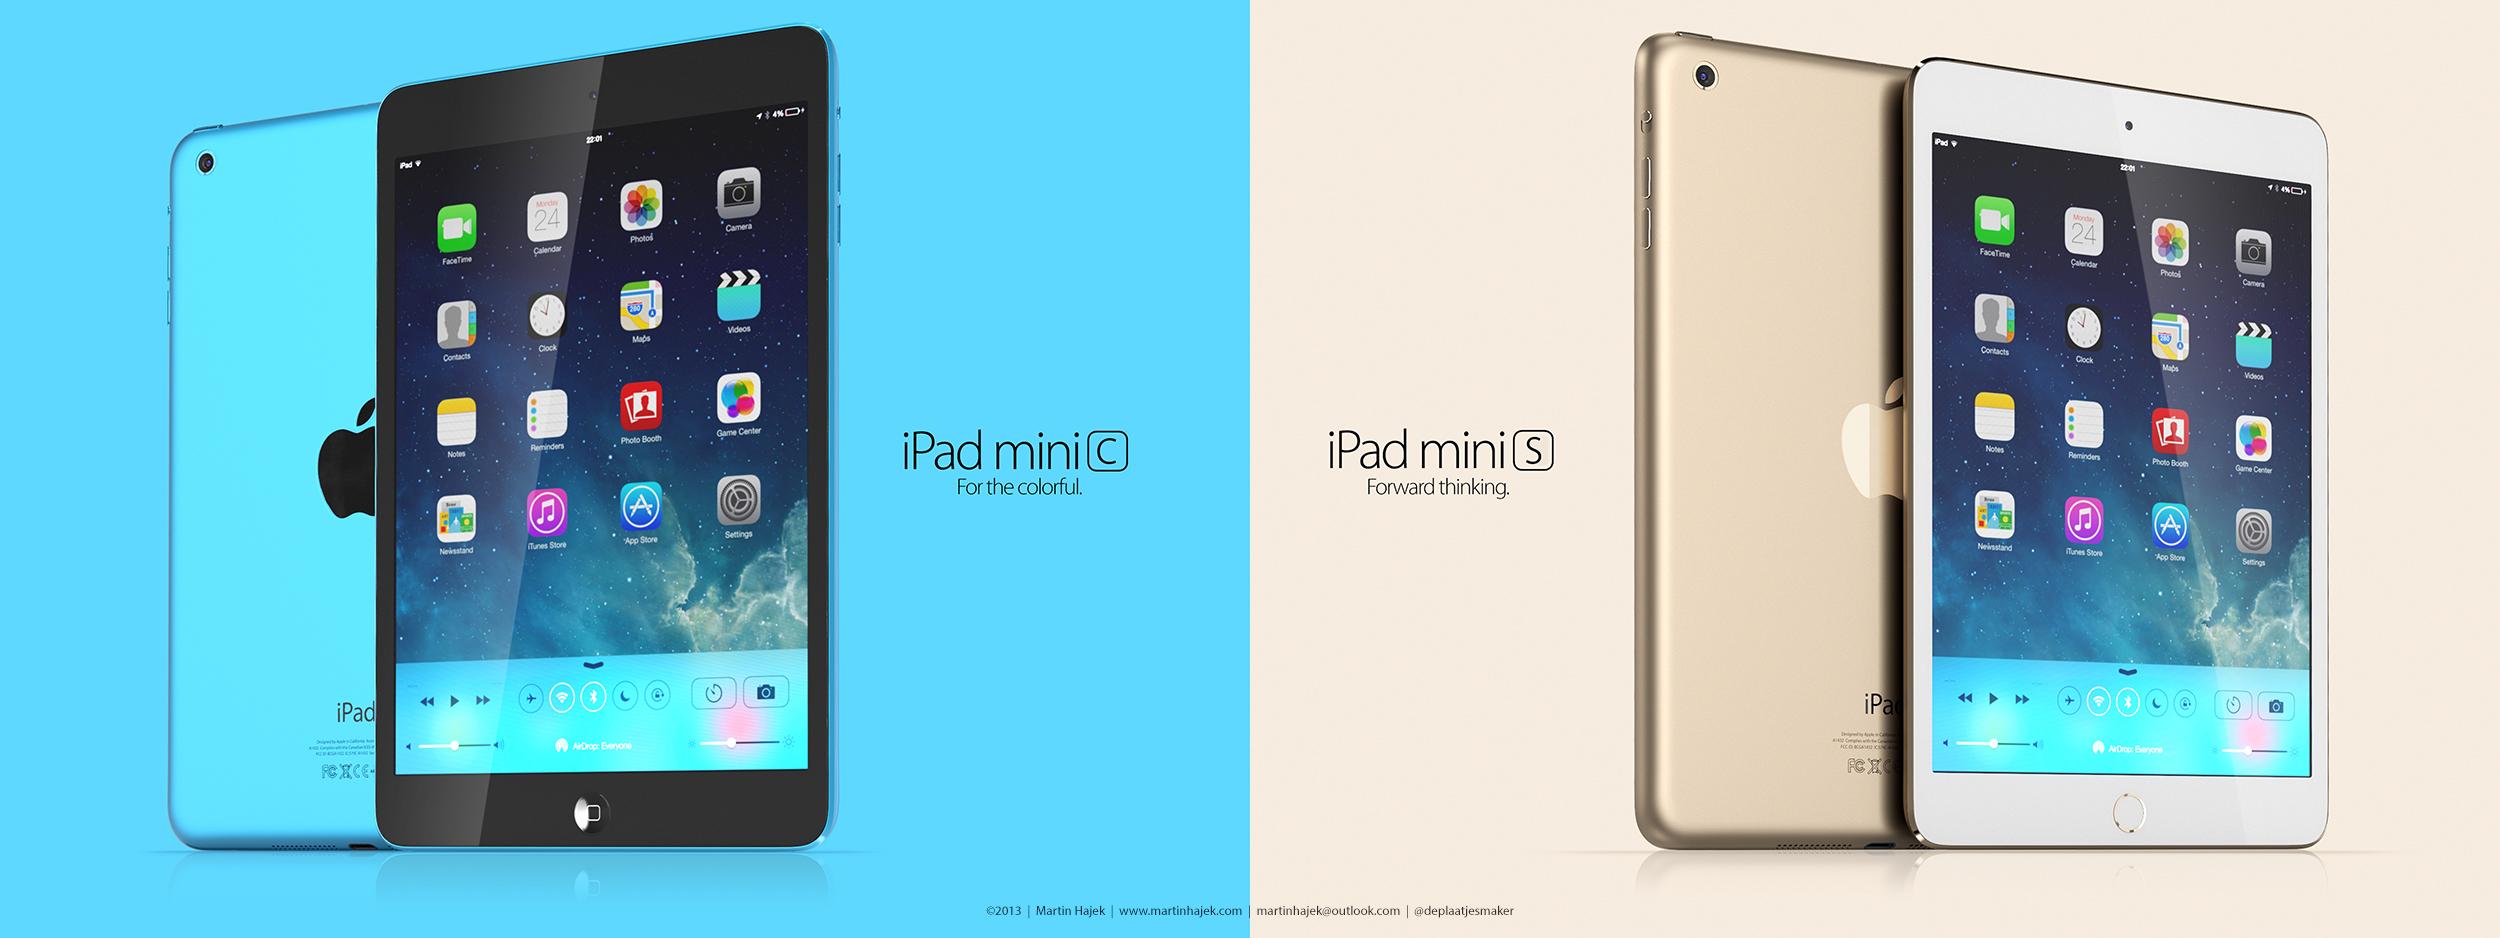 Conceito de iPad mini criado por Martin Hajek